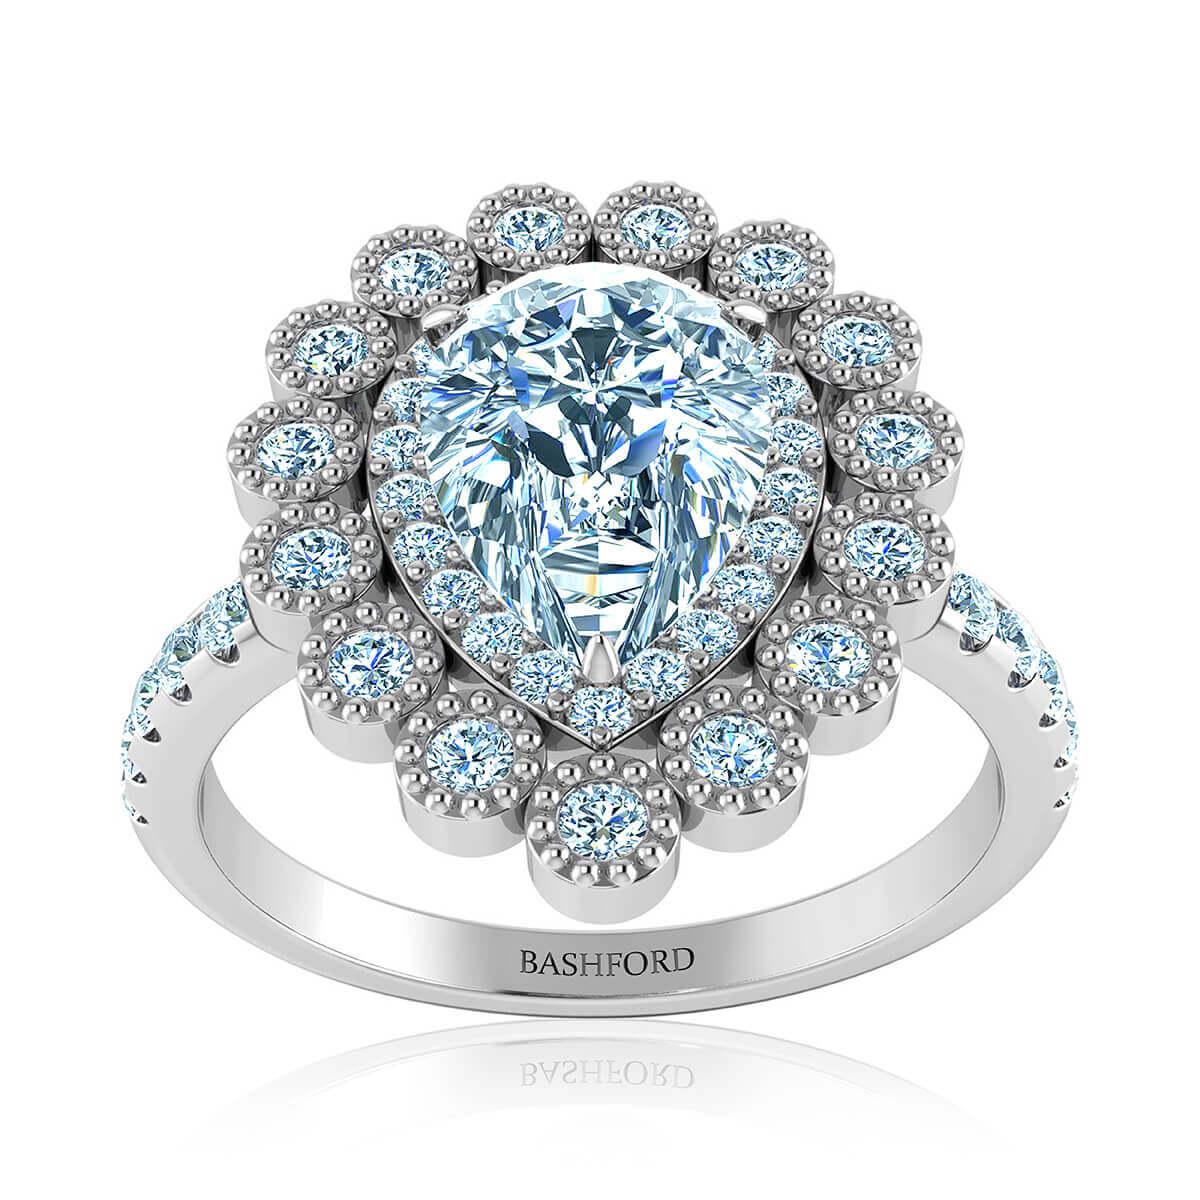 Tularosa Diamond Ring